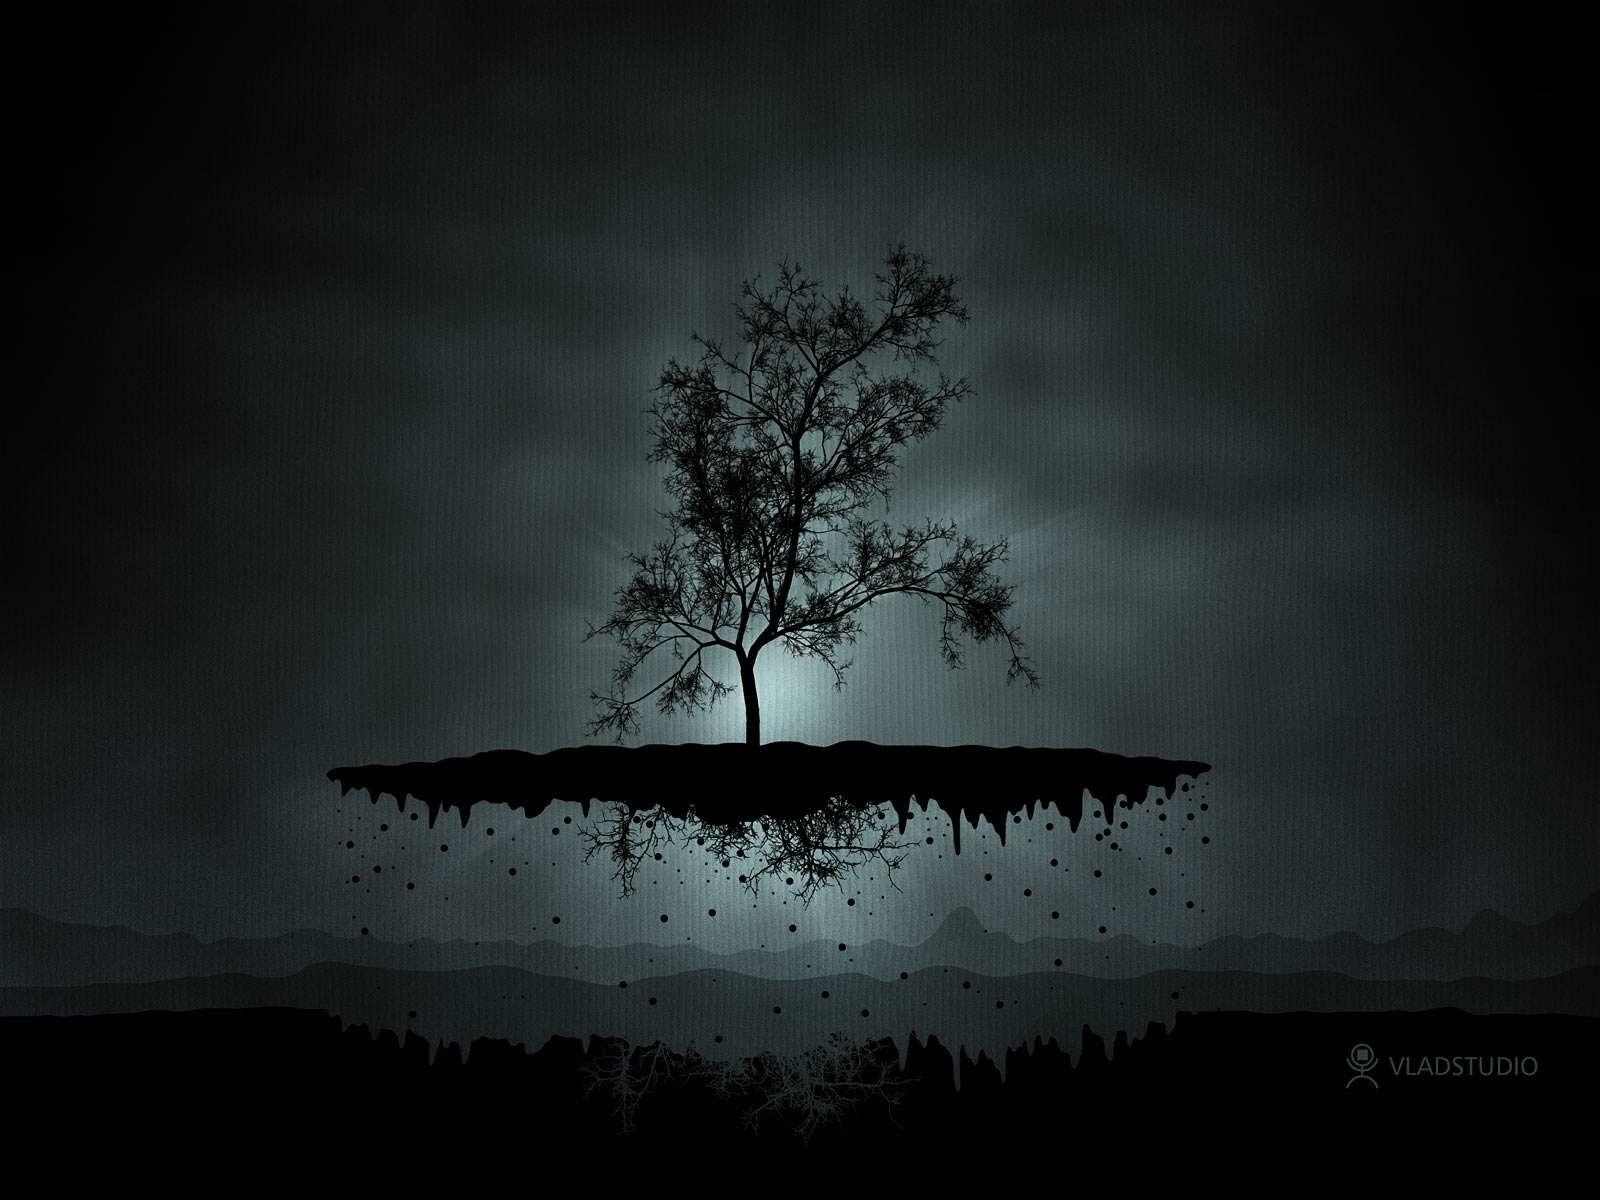 Dark HD Wallpaper